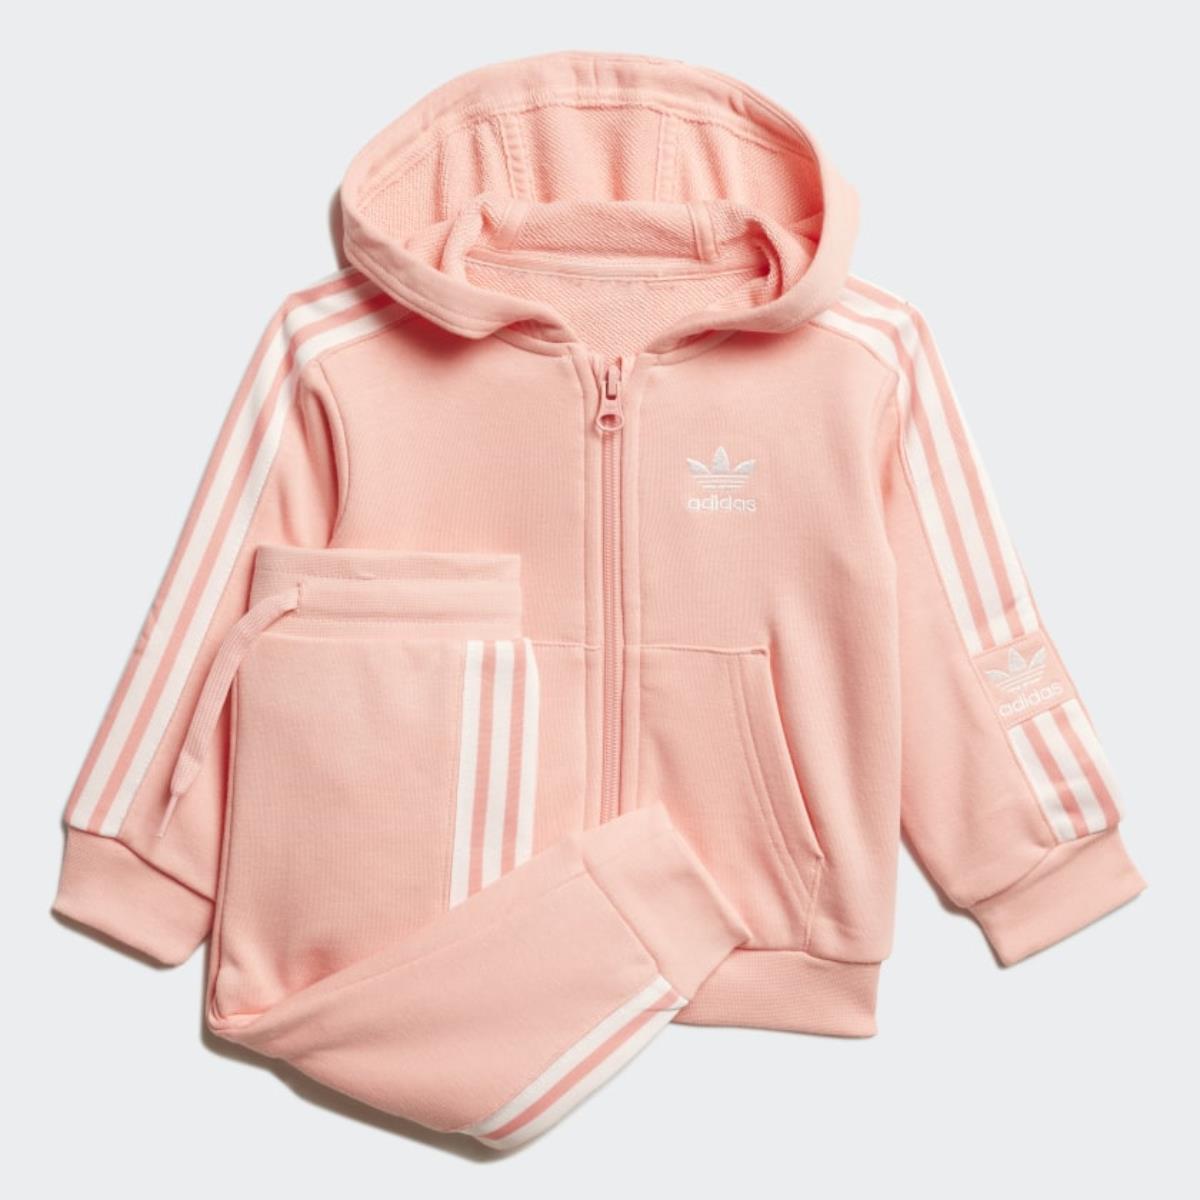 Tuta Adidas Bambina Hoodie FM5603 - Adidas Original